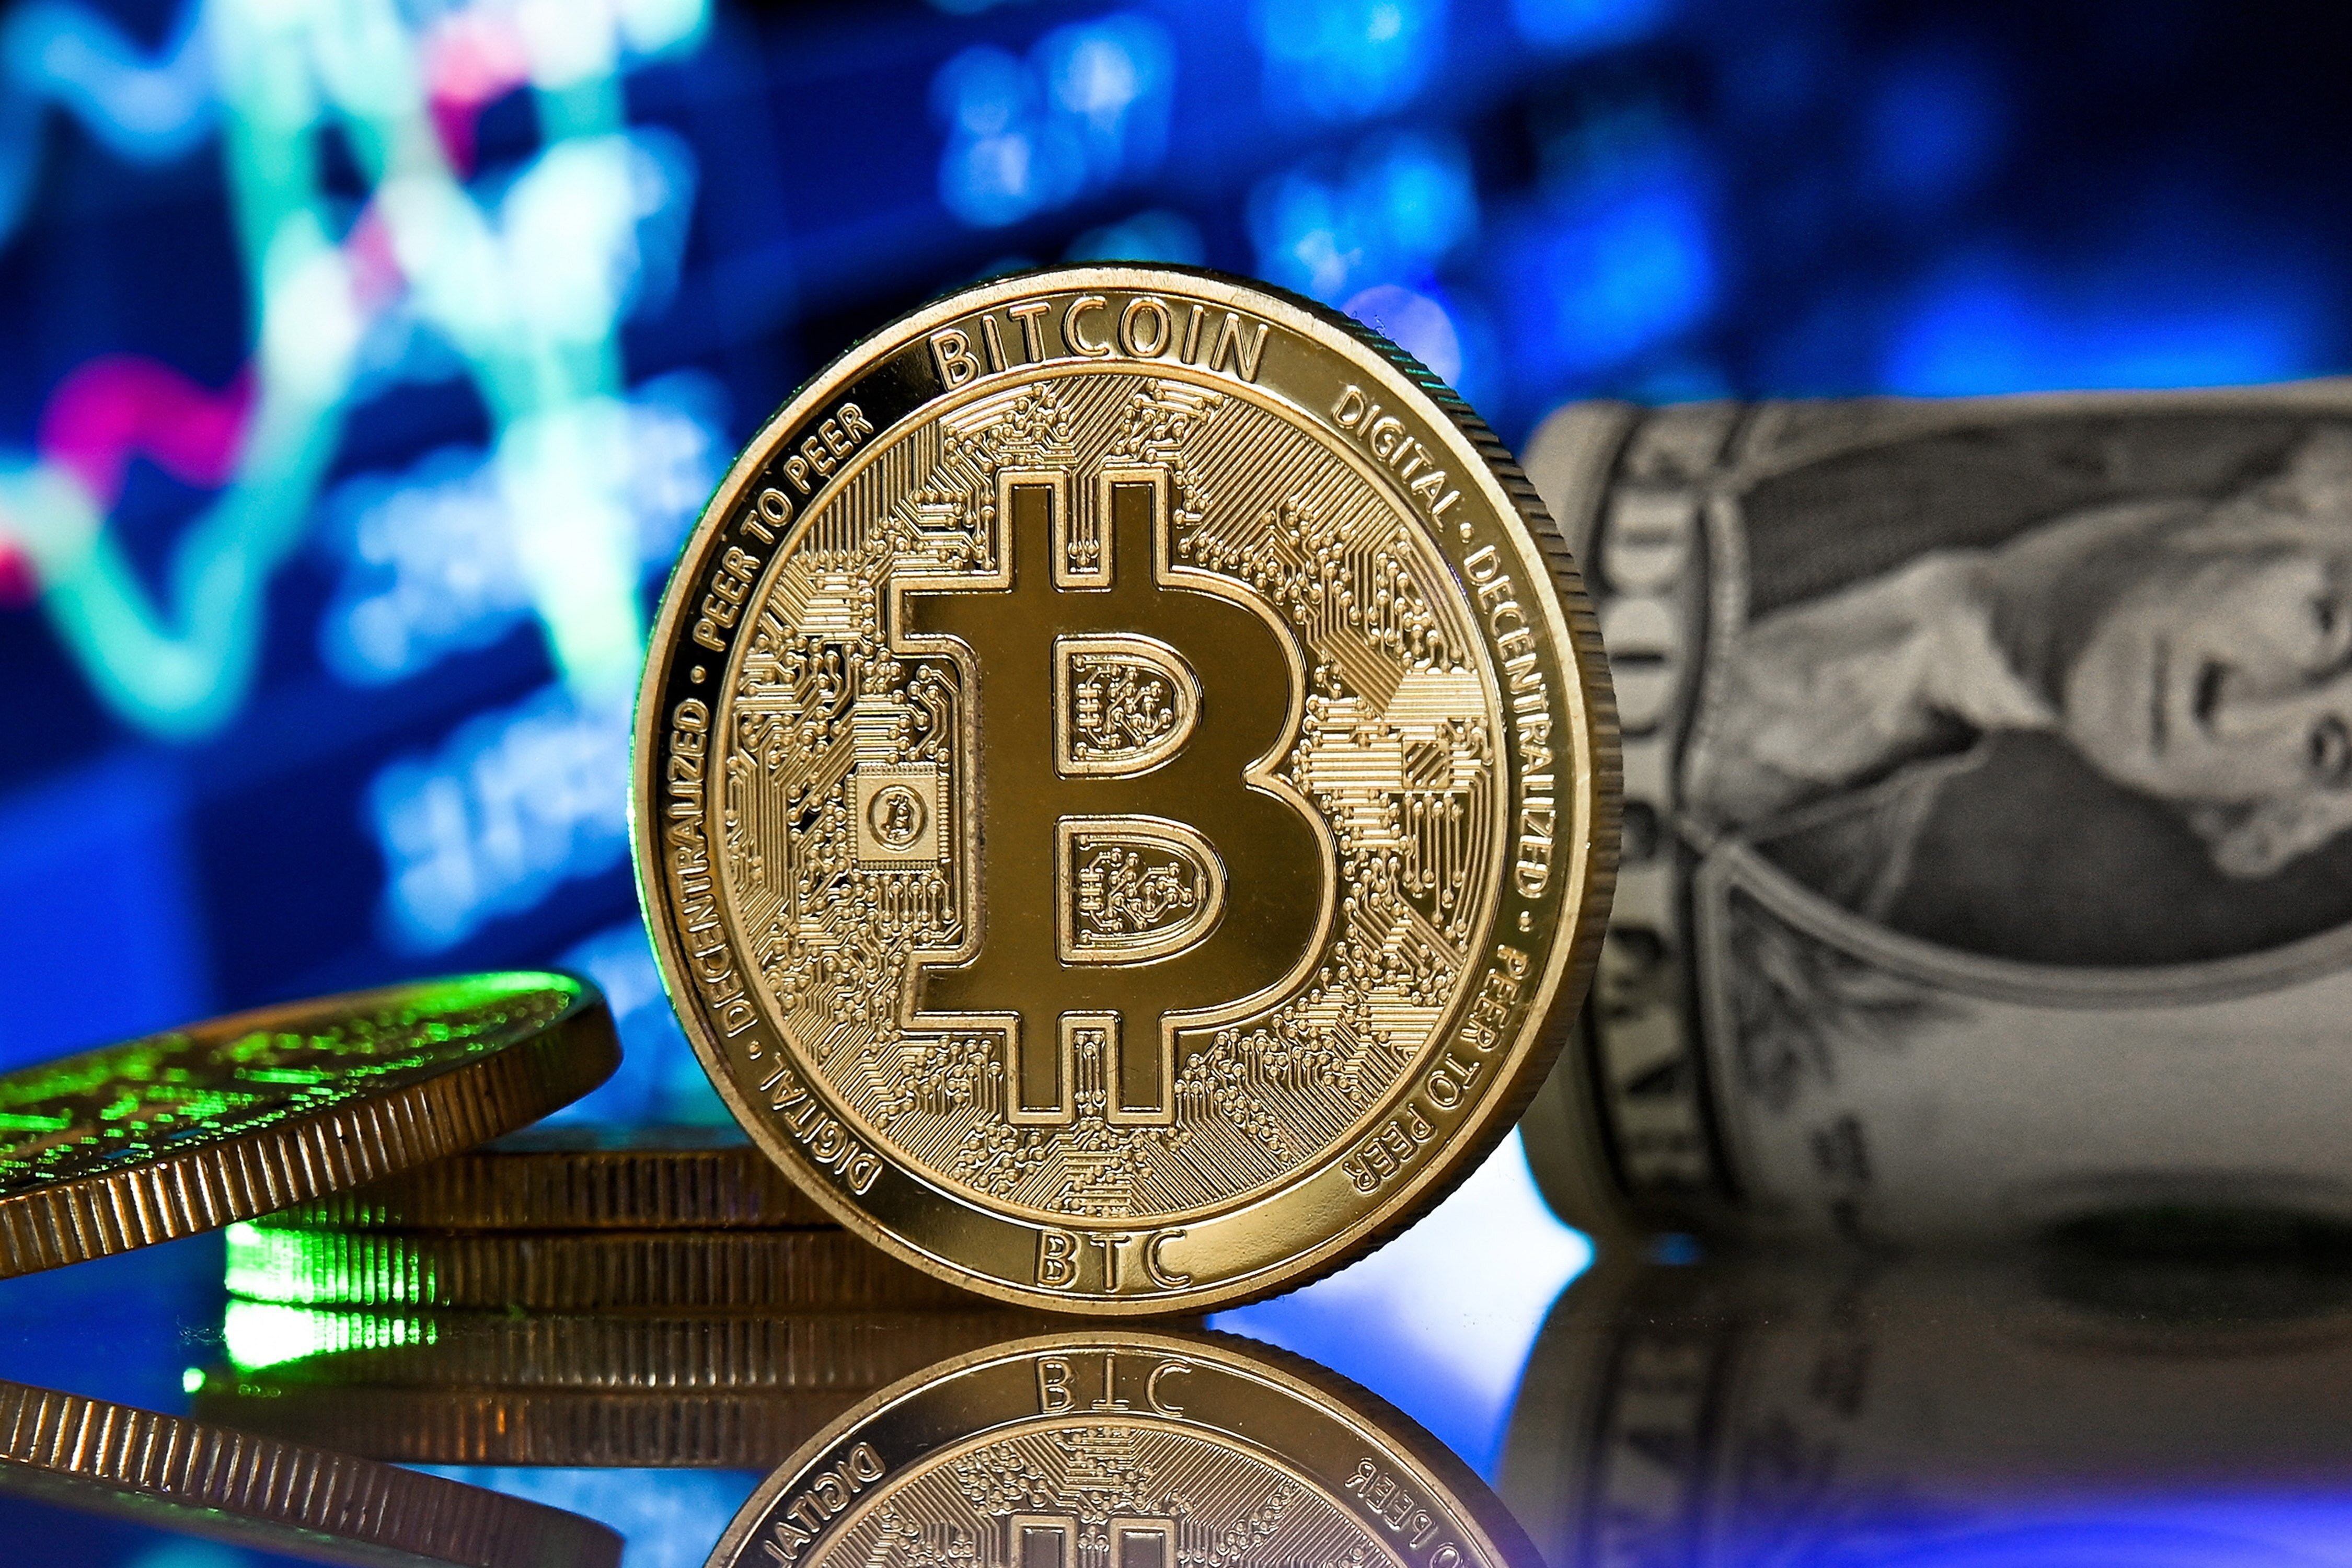 cum să faci profit vânzând bitcoins)